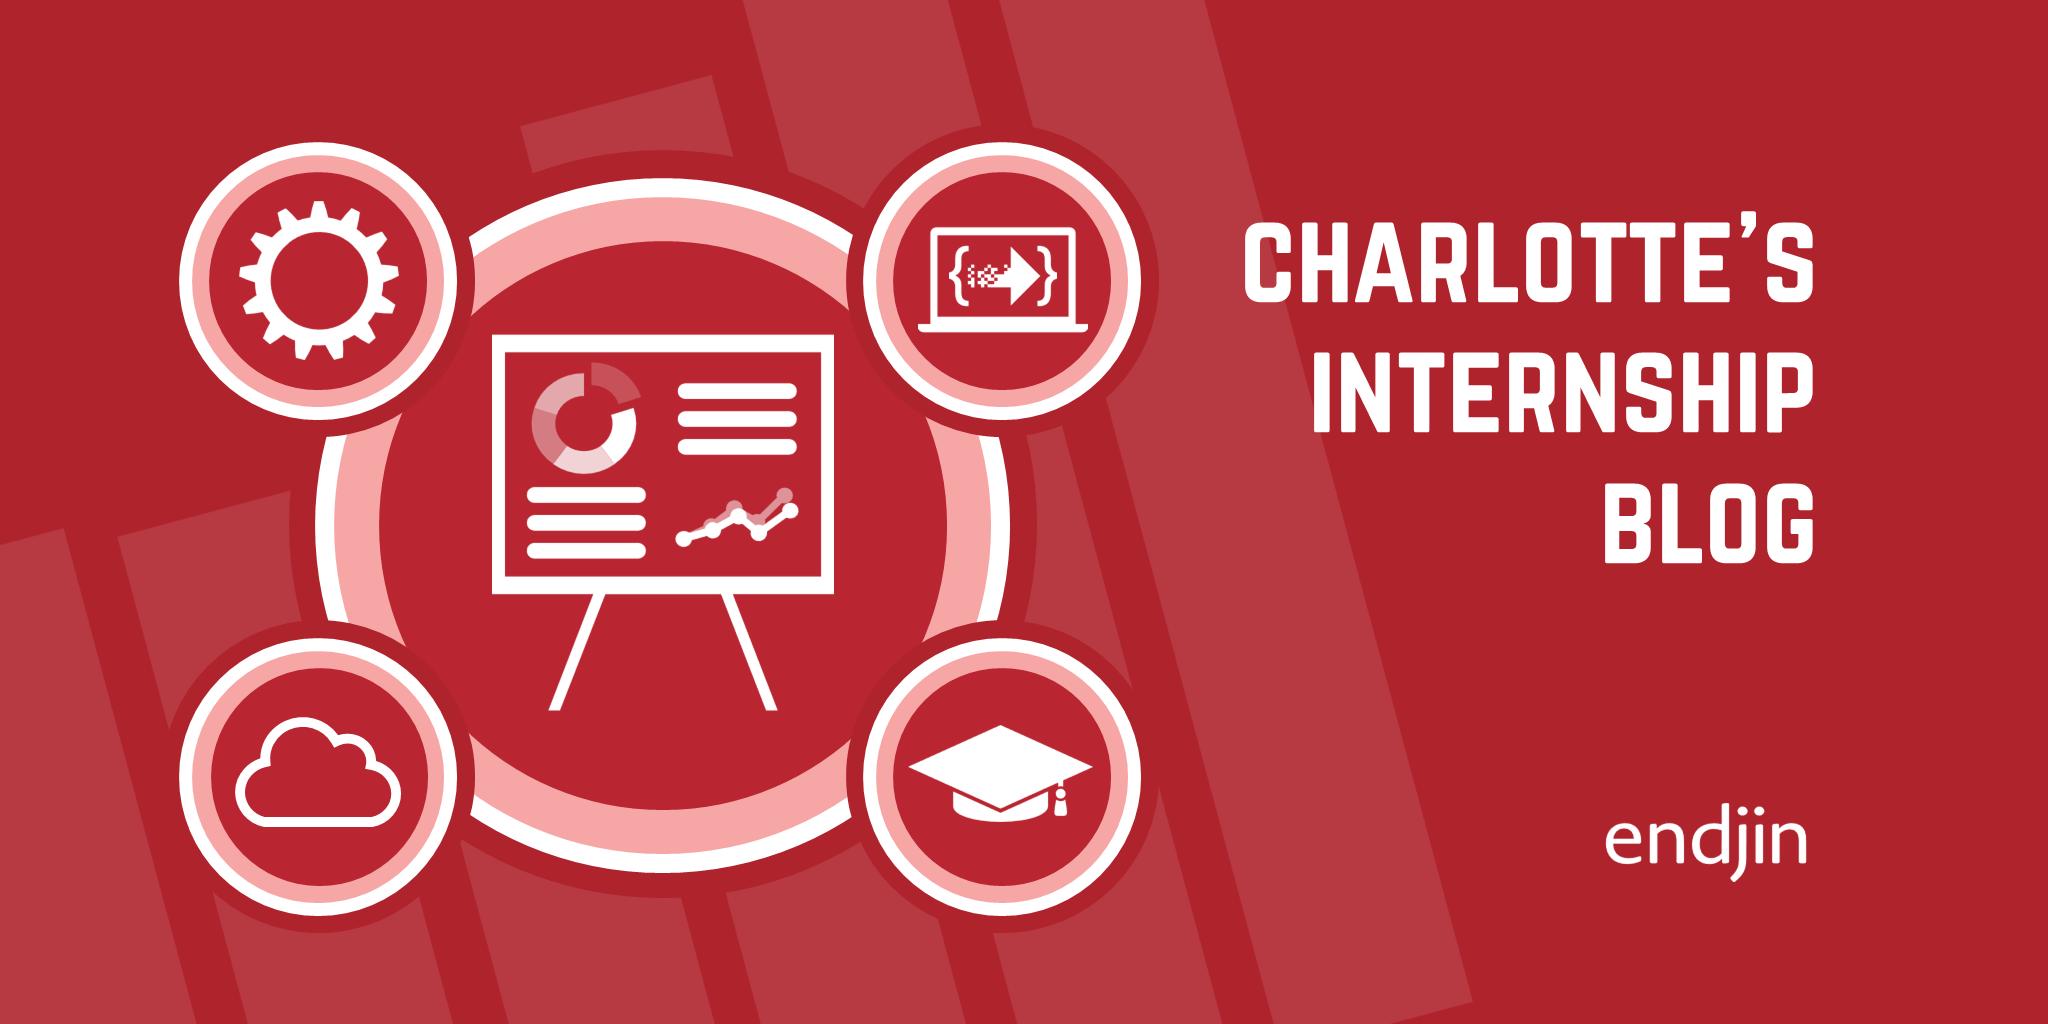 Charlotte's Internship Blog